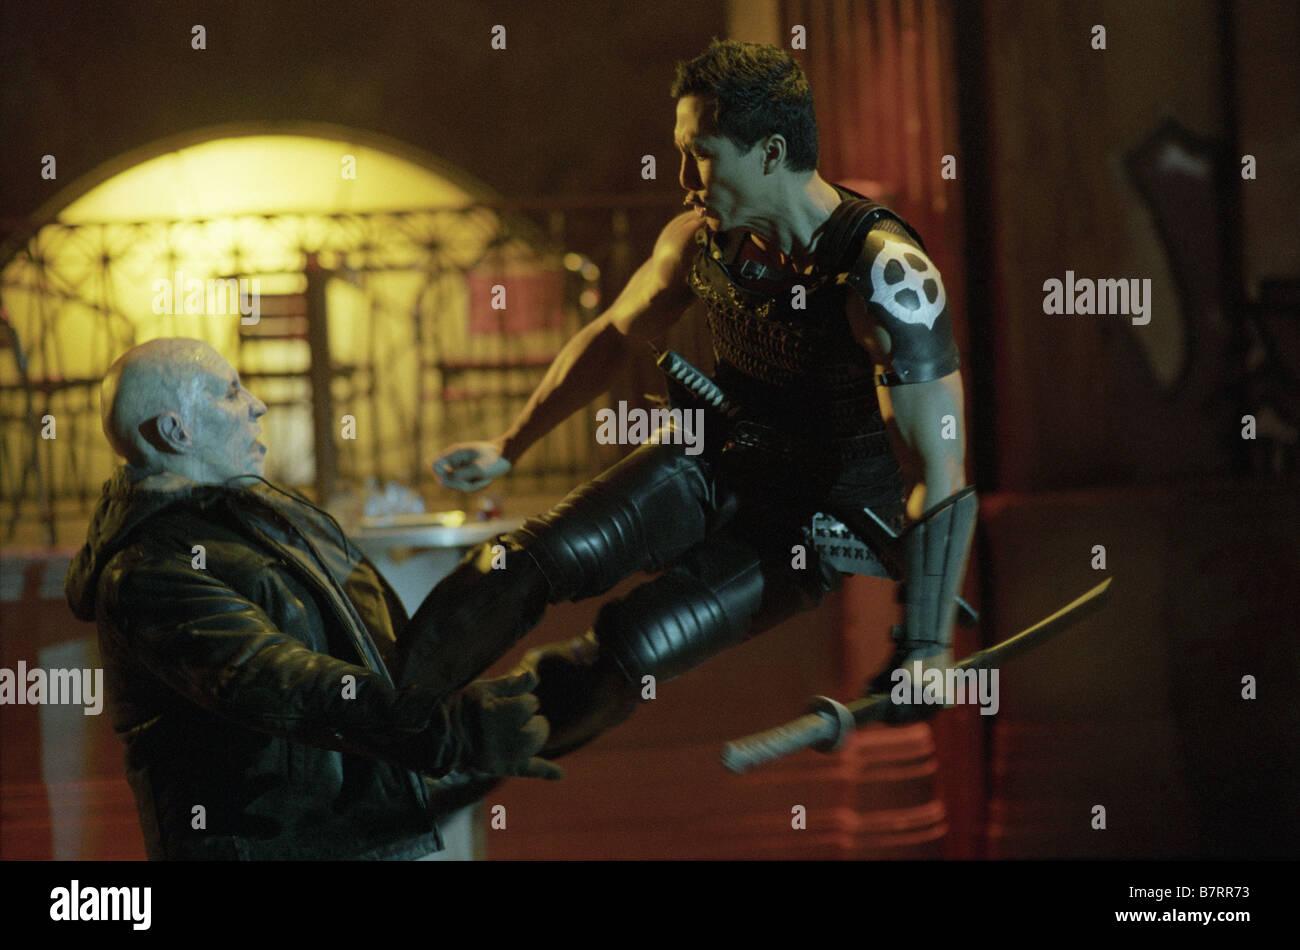 Blade II  Year: 2002 USA Donnie Yen Director: Guillermo del Toro - Stock Image